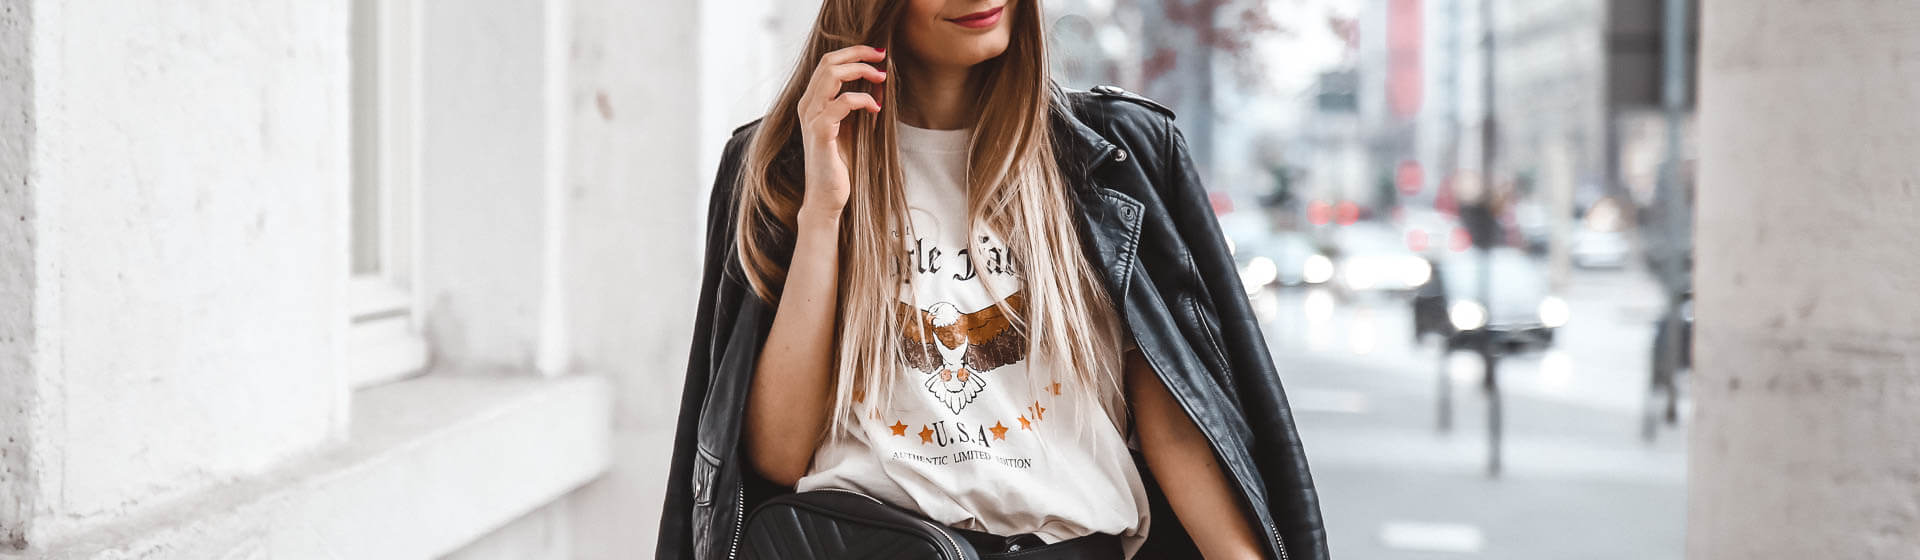 Print-Shirts und Lederjacke Outfit